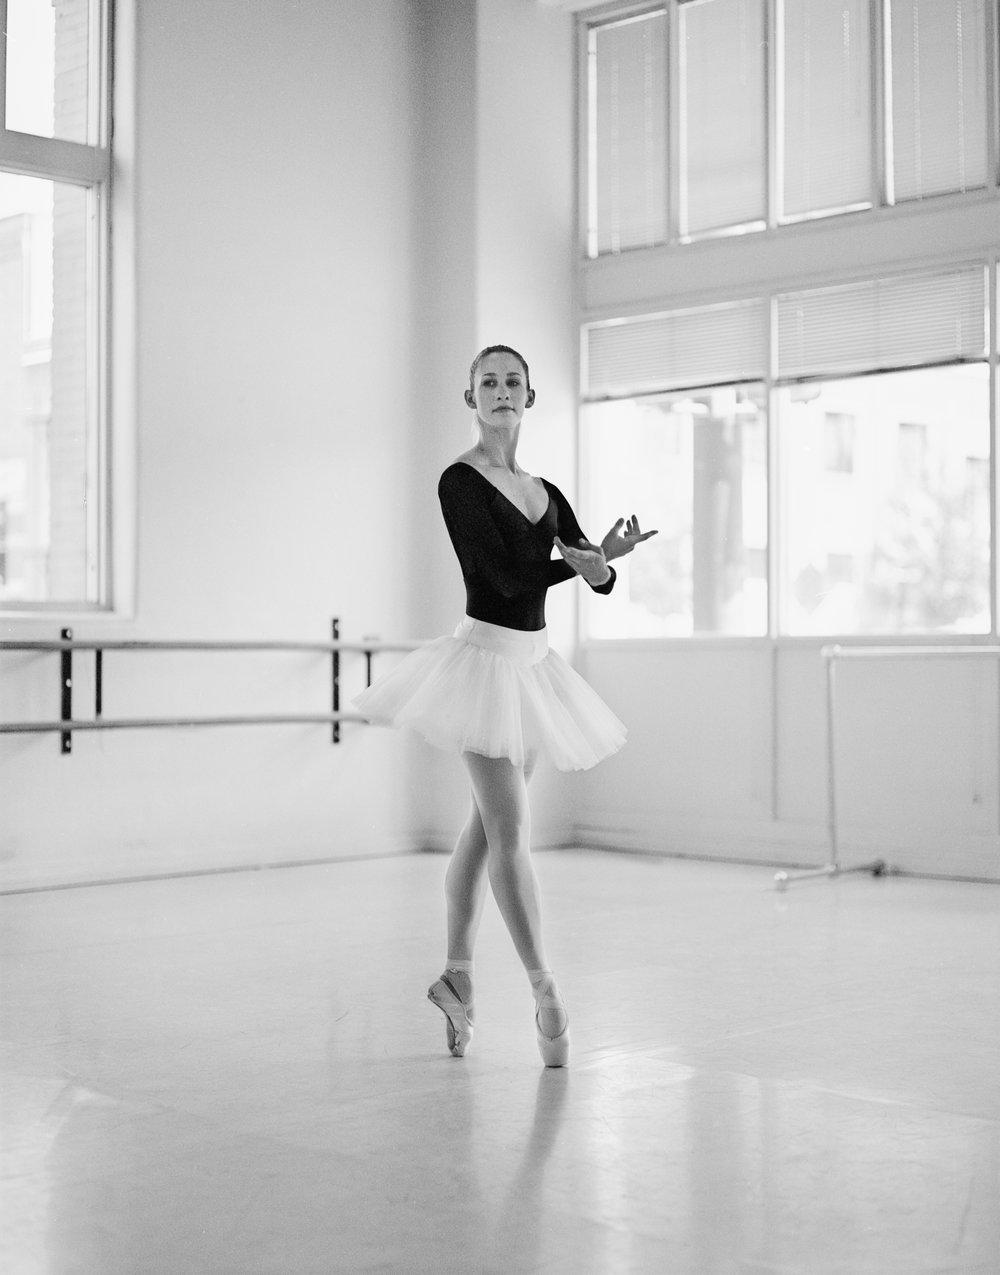 Jessica_Ballet-31.JPG